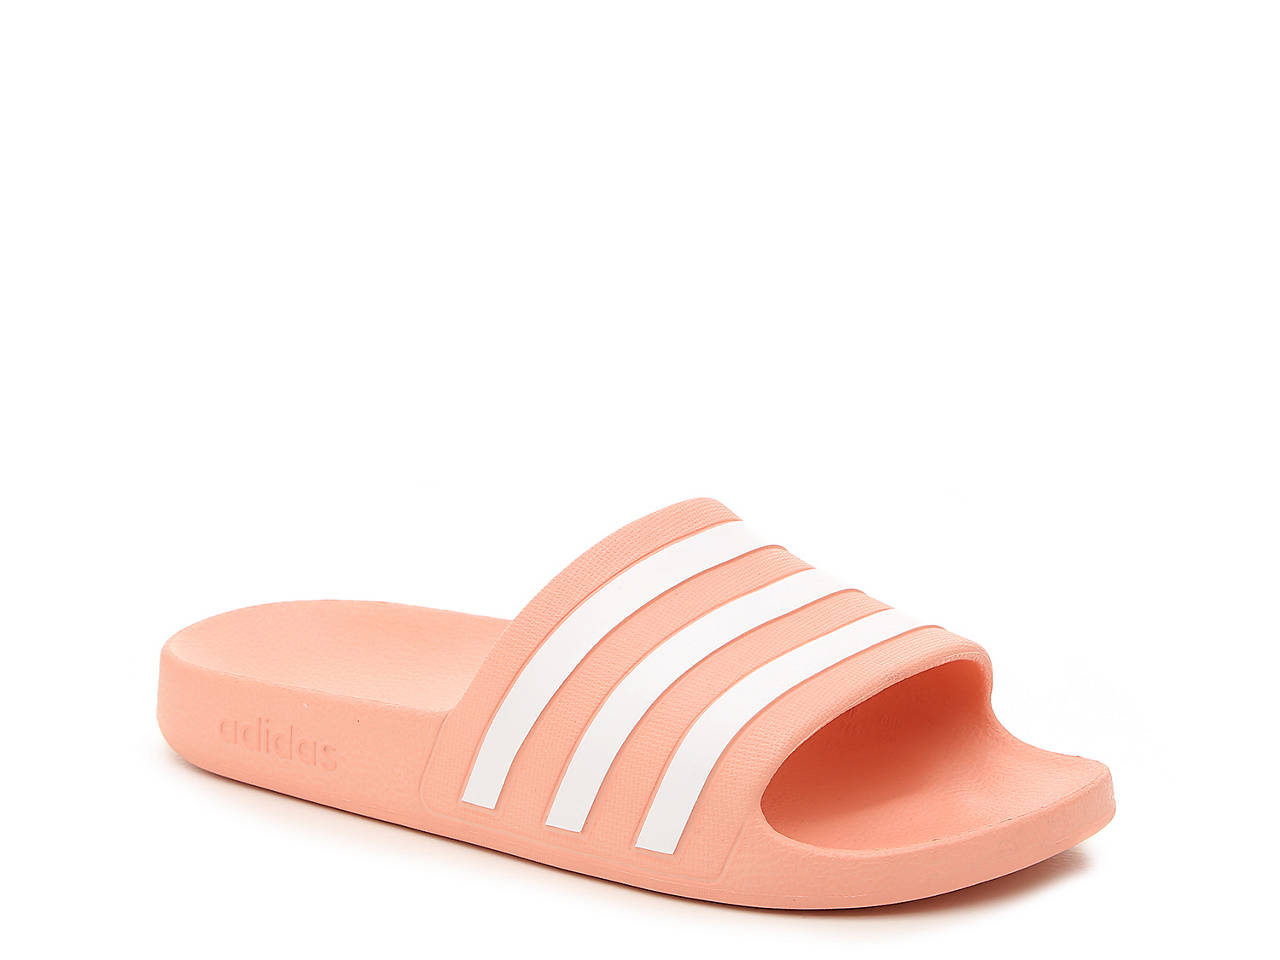 9d36b23ed76c adidas Adilette Aqua Slide Sandal - Women s Women s Shoes